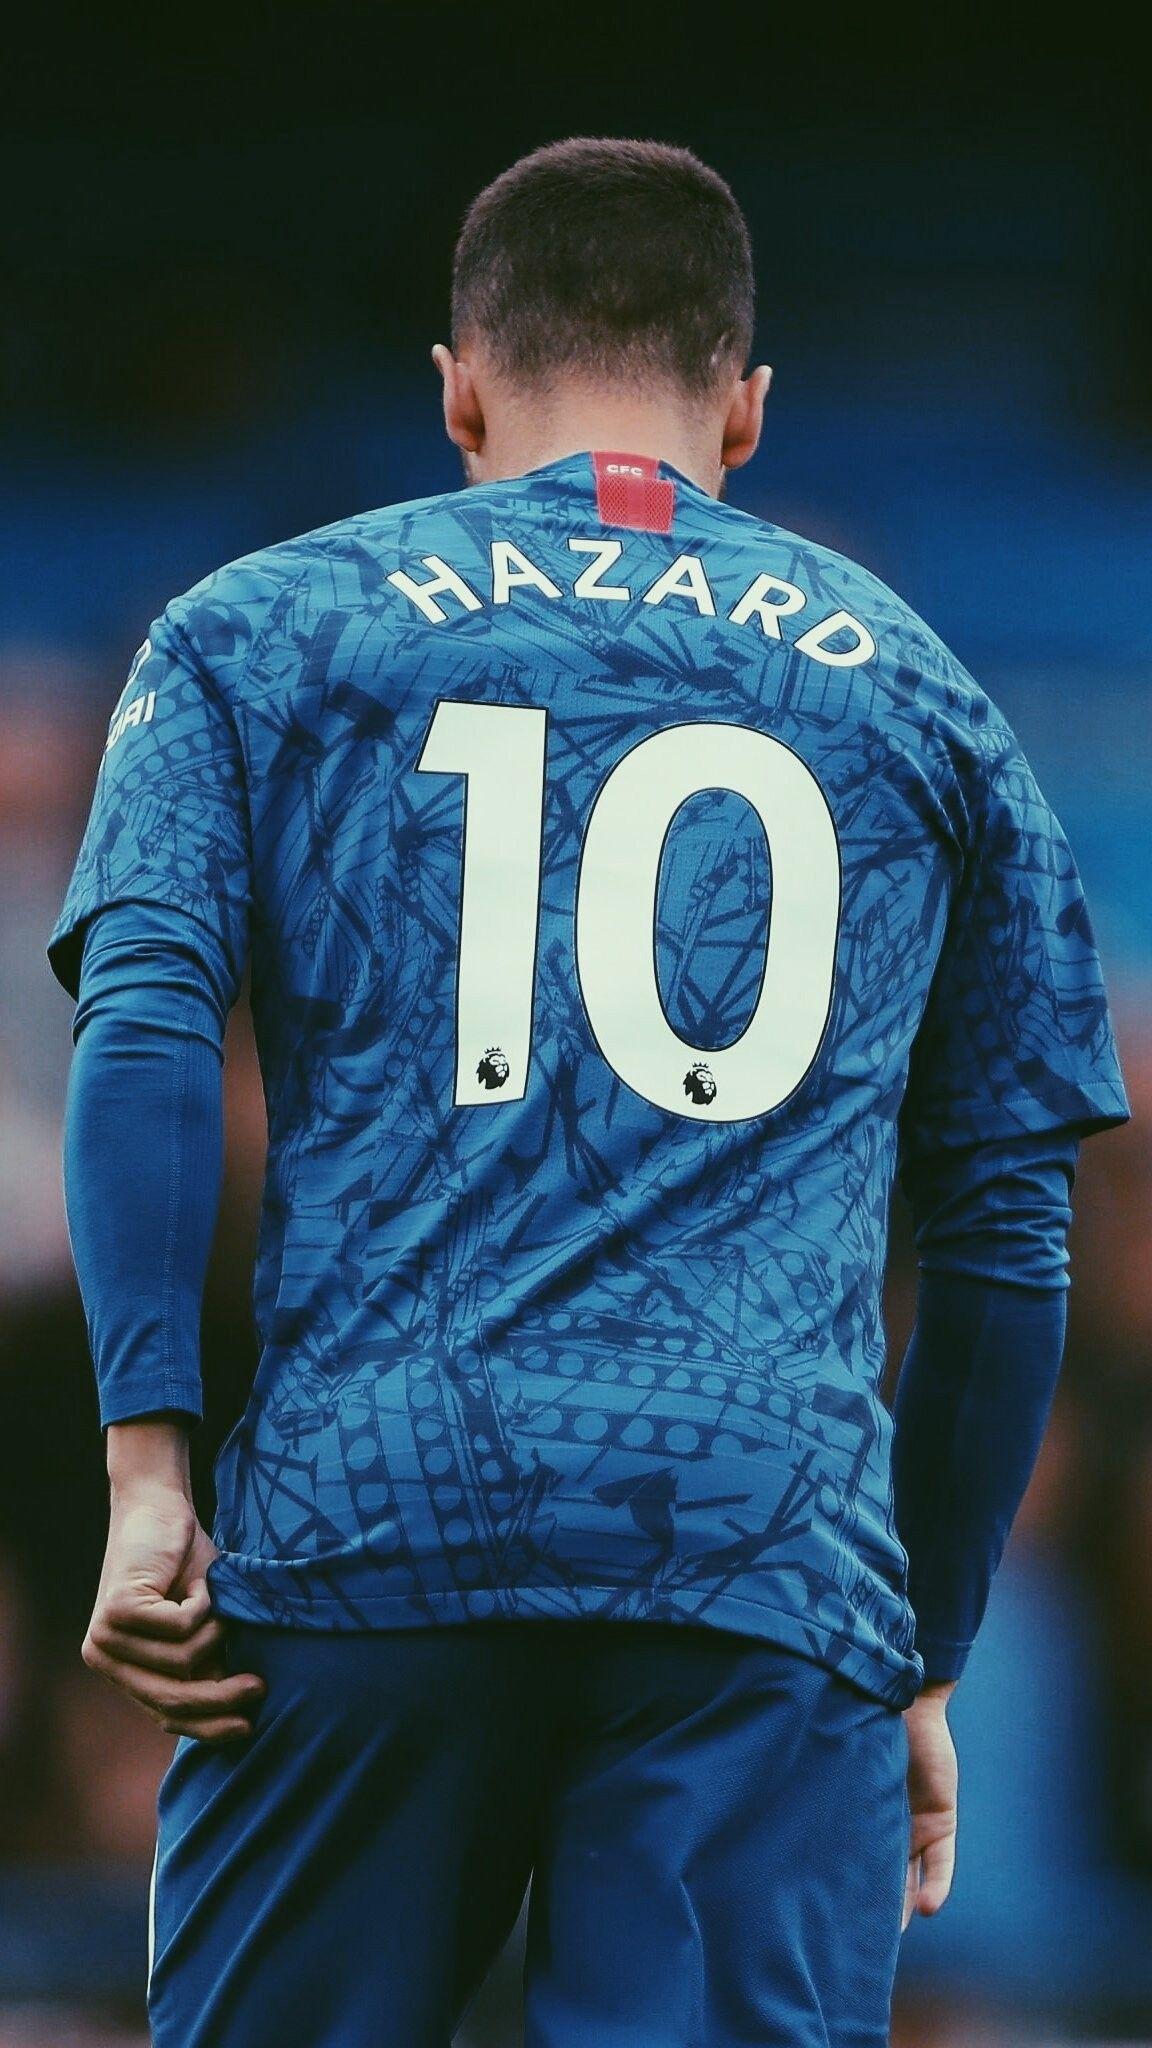 Pin De Gaynoz Em Chelsea Jogadores De Futebol Melhores Jogadores De Futebol Futebol